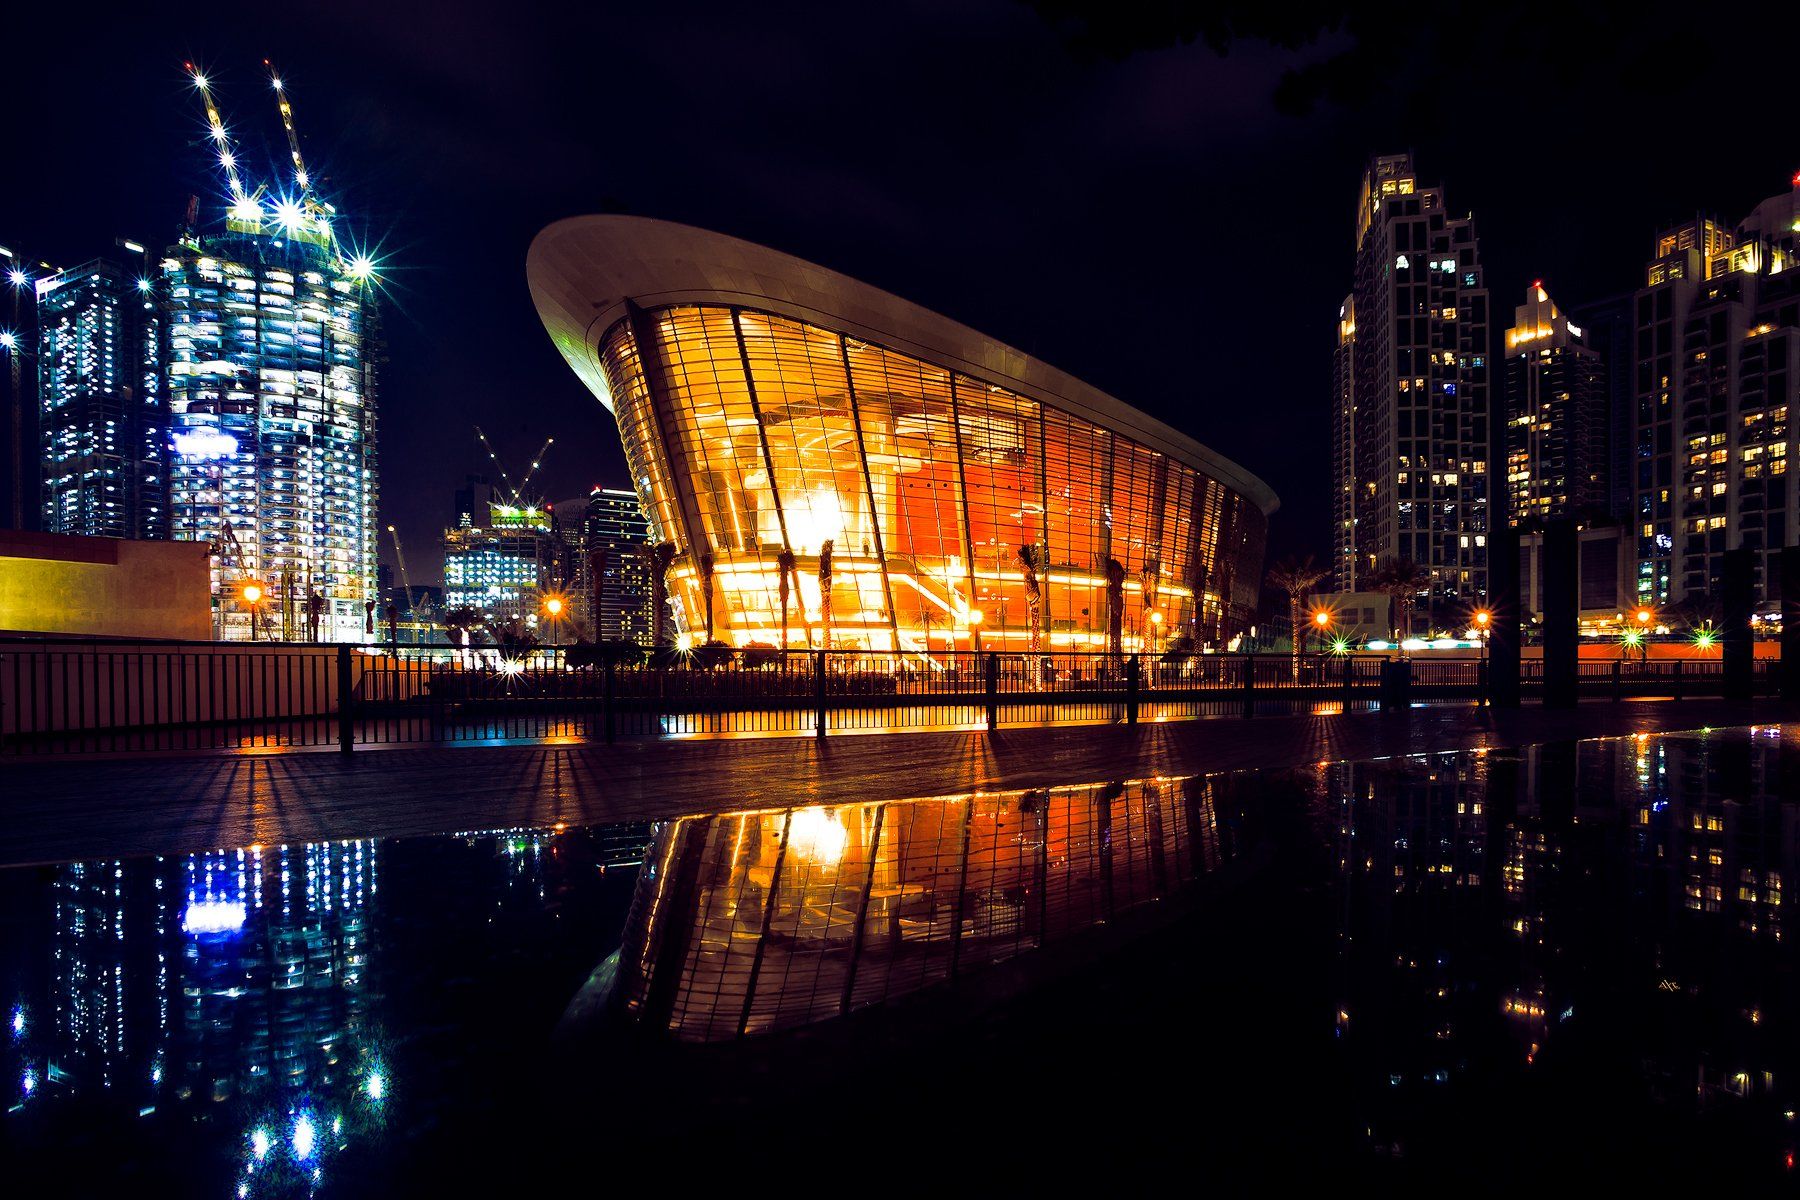 dubai, cityscape, night, opera, architecture, Руслан Болгов (Axe)